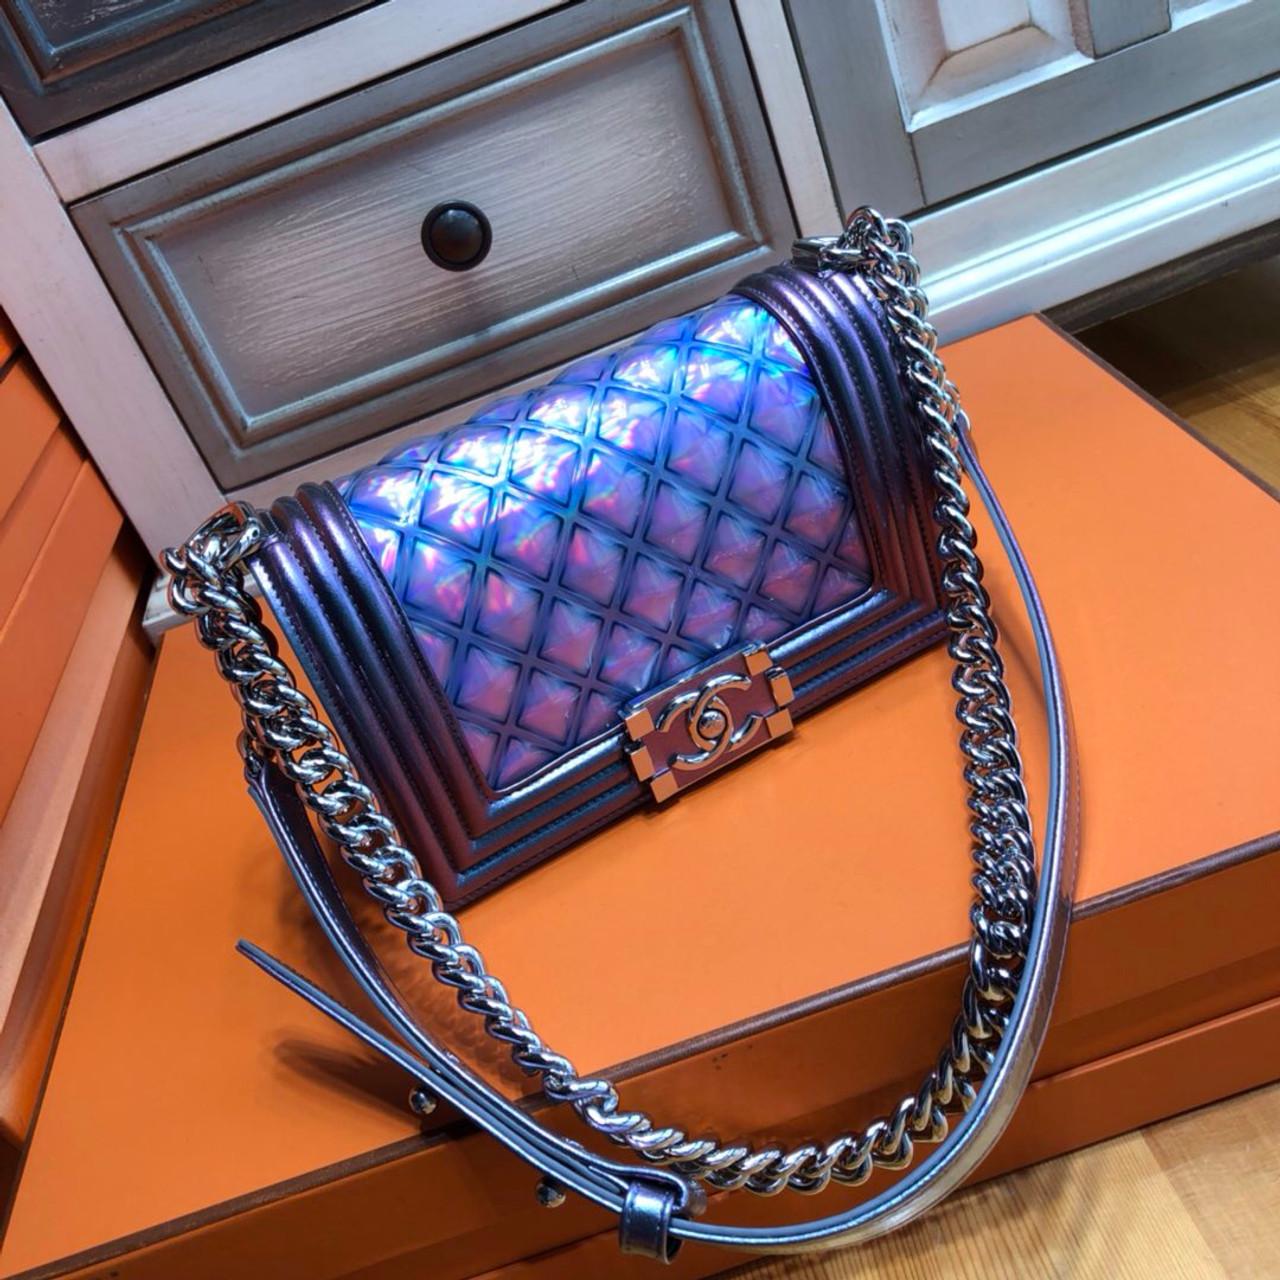 CHANL Small PVC BOY CHANEL Handbag - Bella Vita Moda 7a1bcbdd718bb